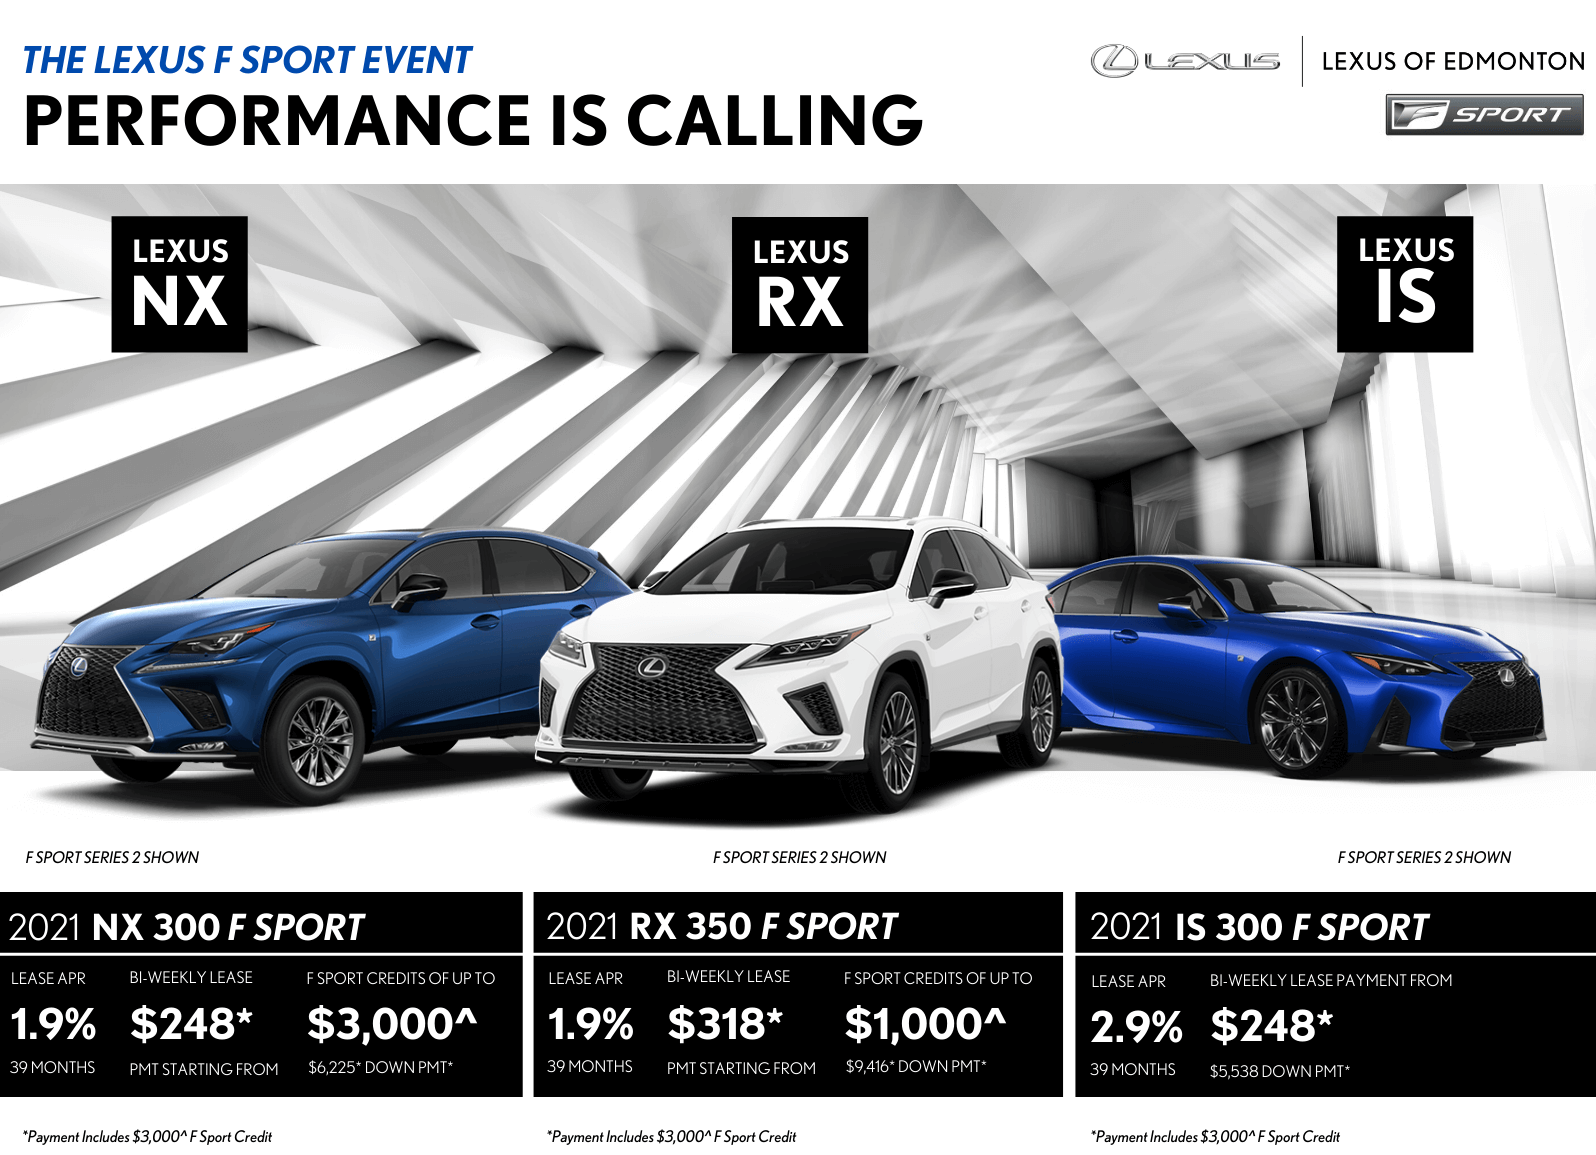 performance calling